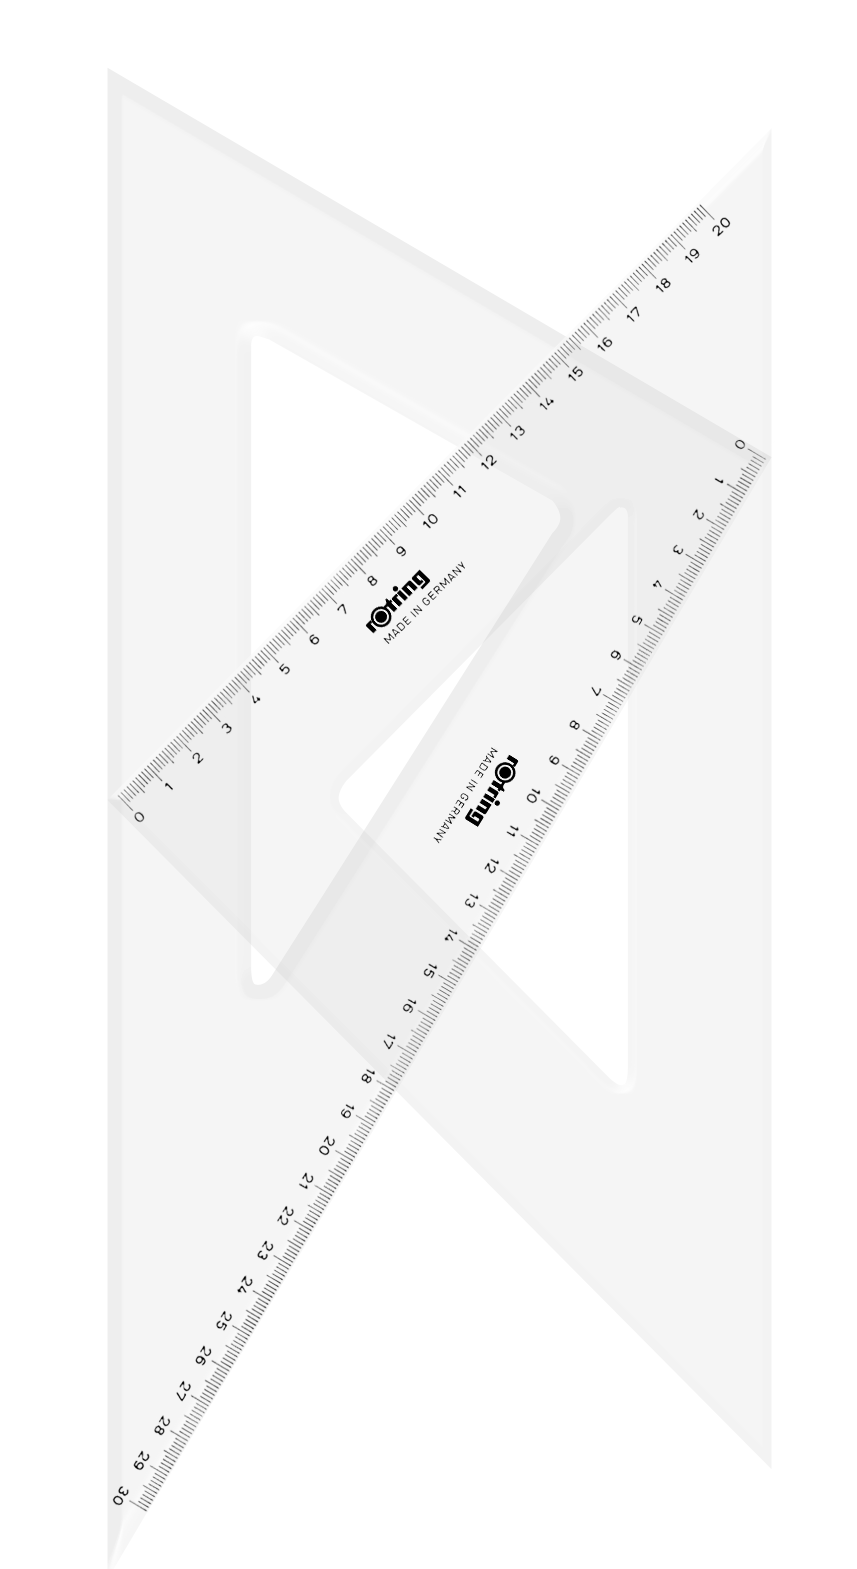 Echer 45° si 30°/60° 30cm 2 buc/set ROTRING Centro